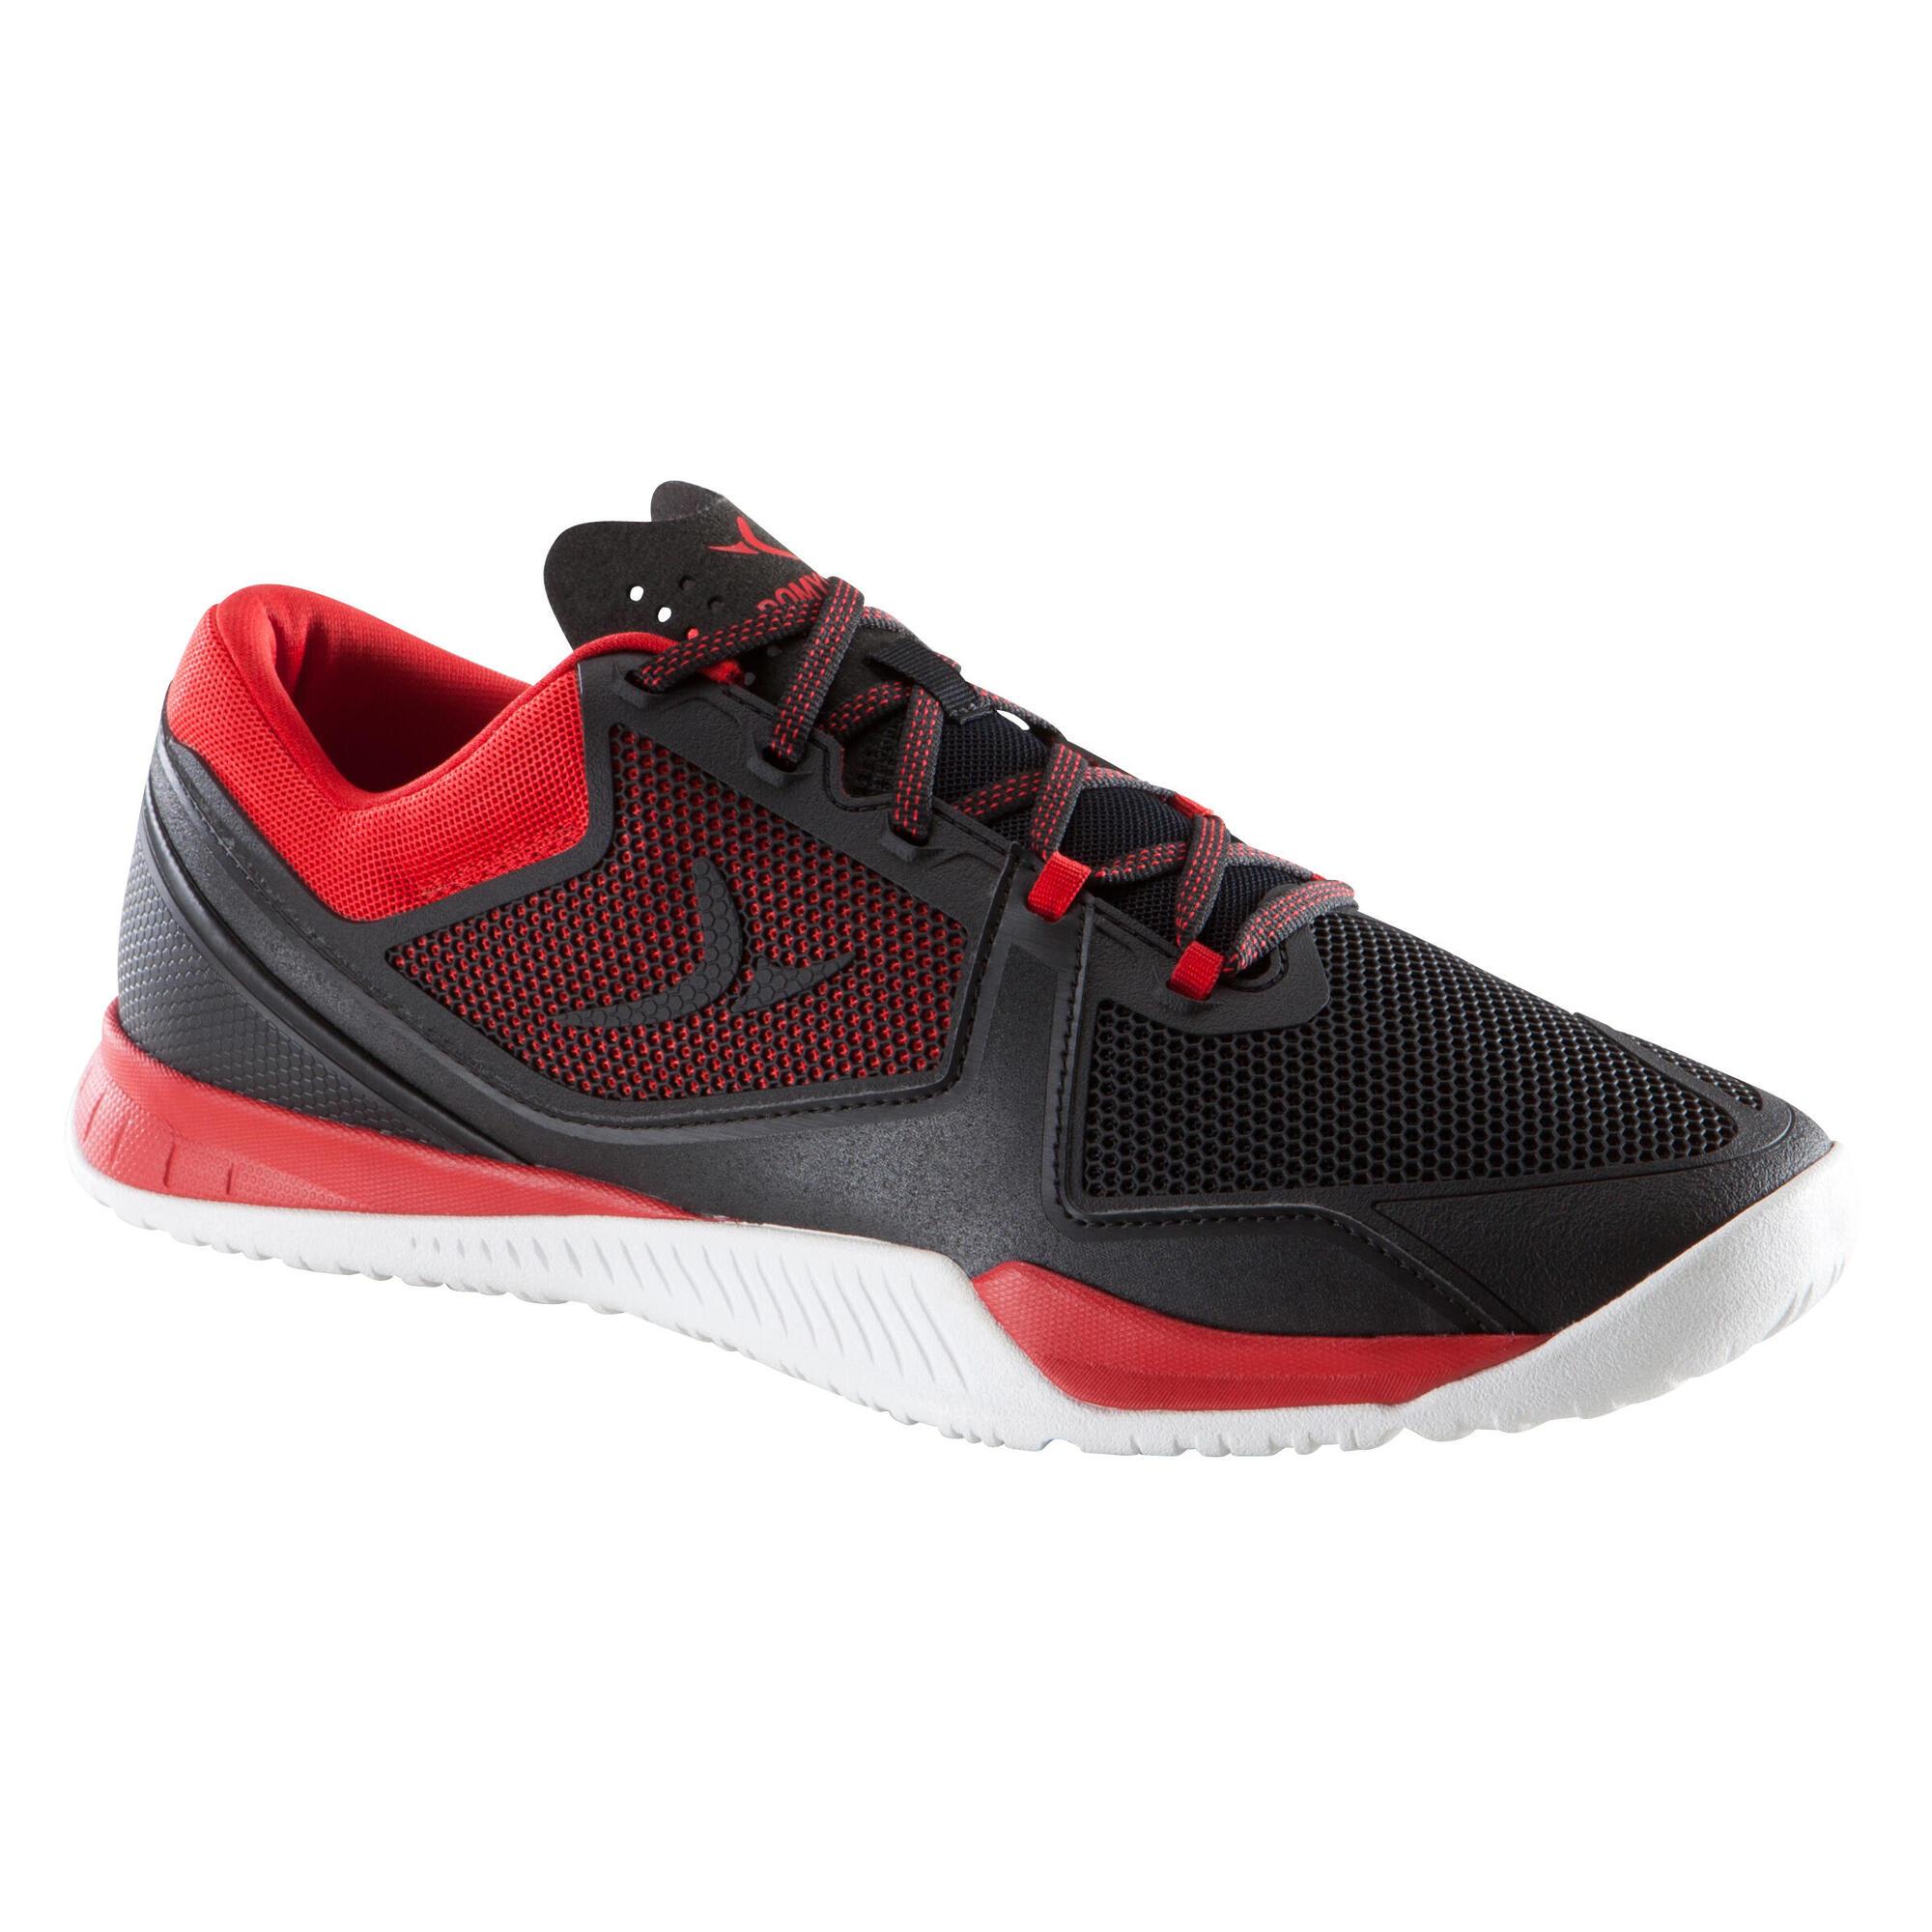 chaussure de cross training homme noir et rouge strong 900 domyos by decathlon. Black Bedroom Furniture Sets. Home Design Ideas